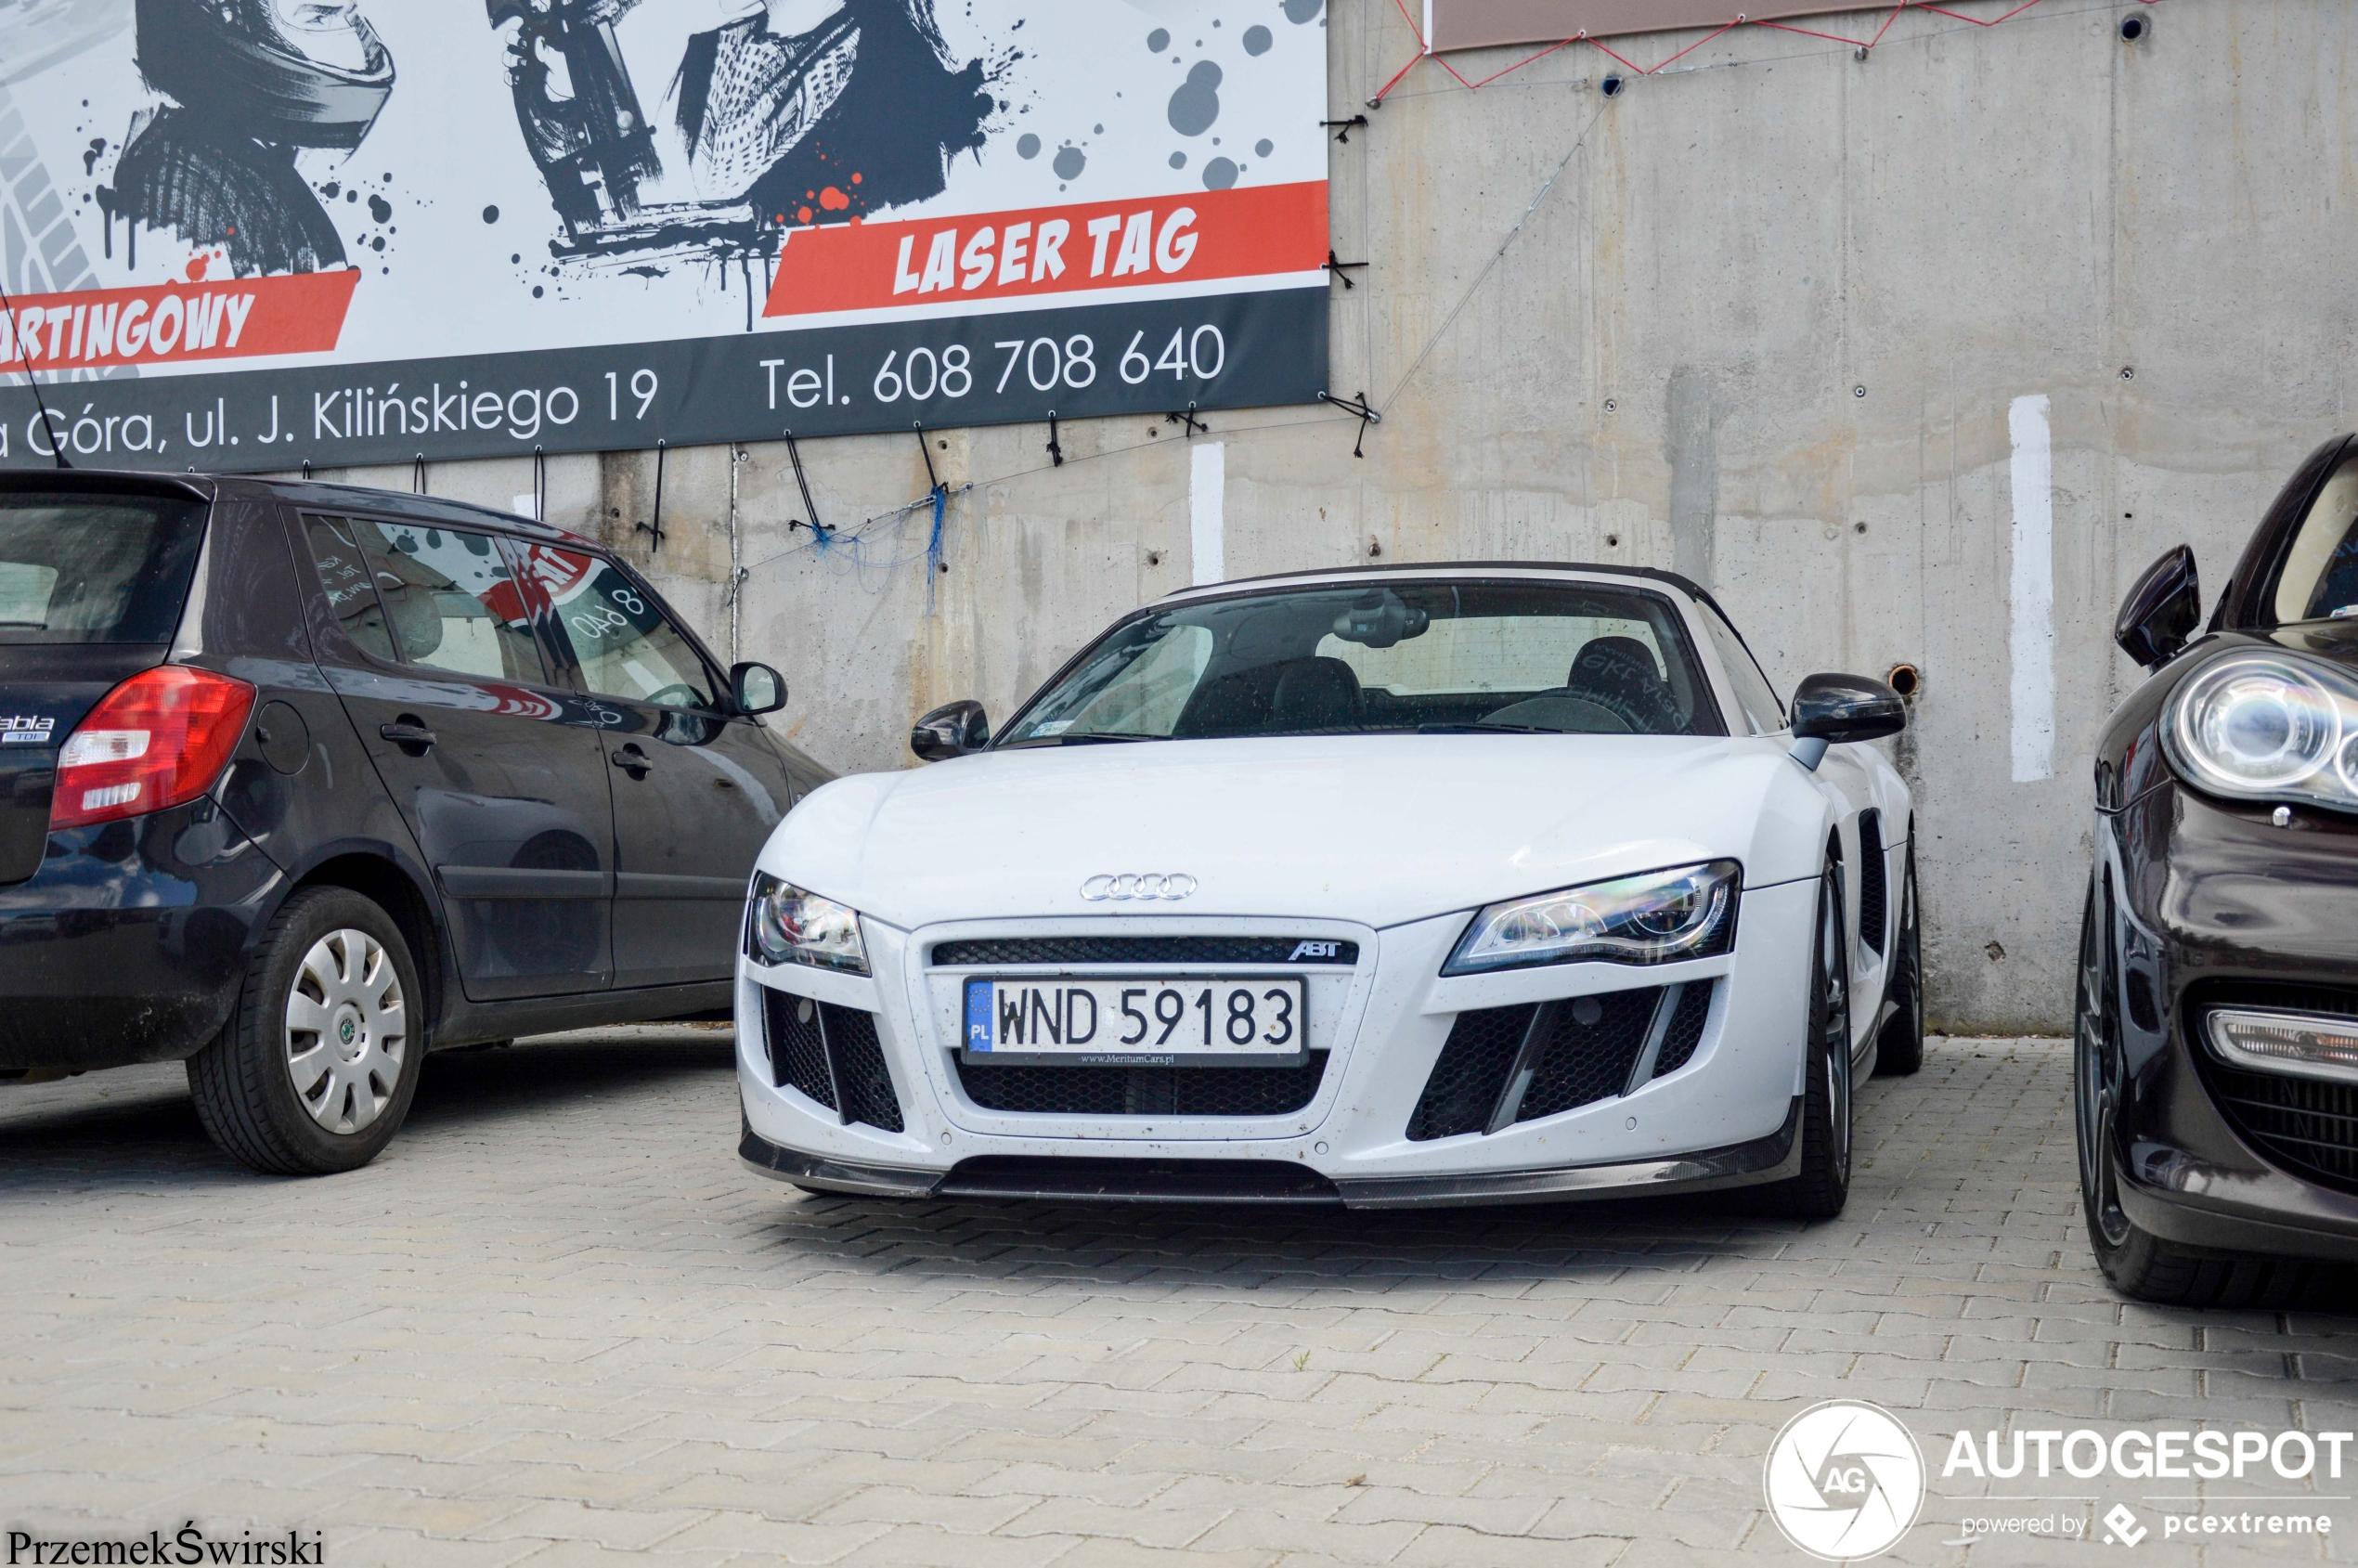 Audi ABT R8 V10 Spyder